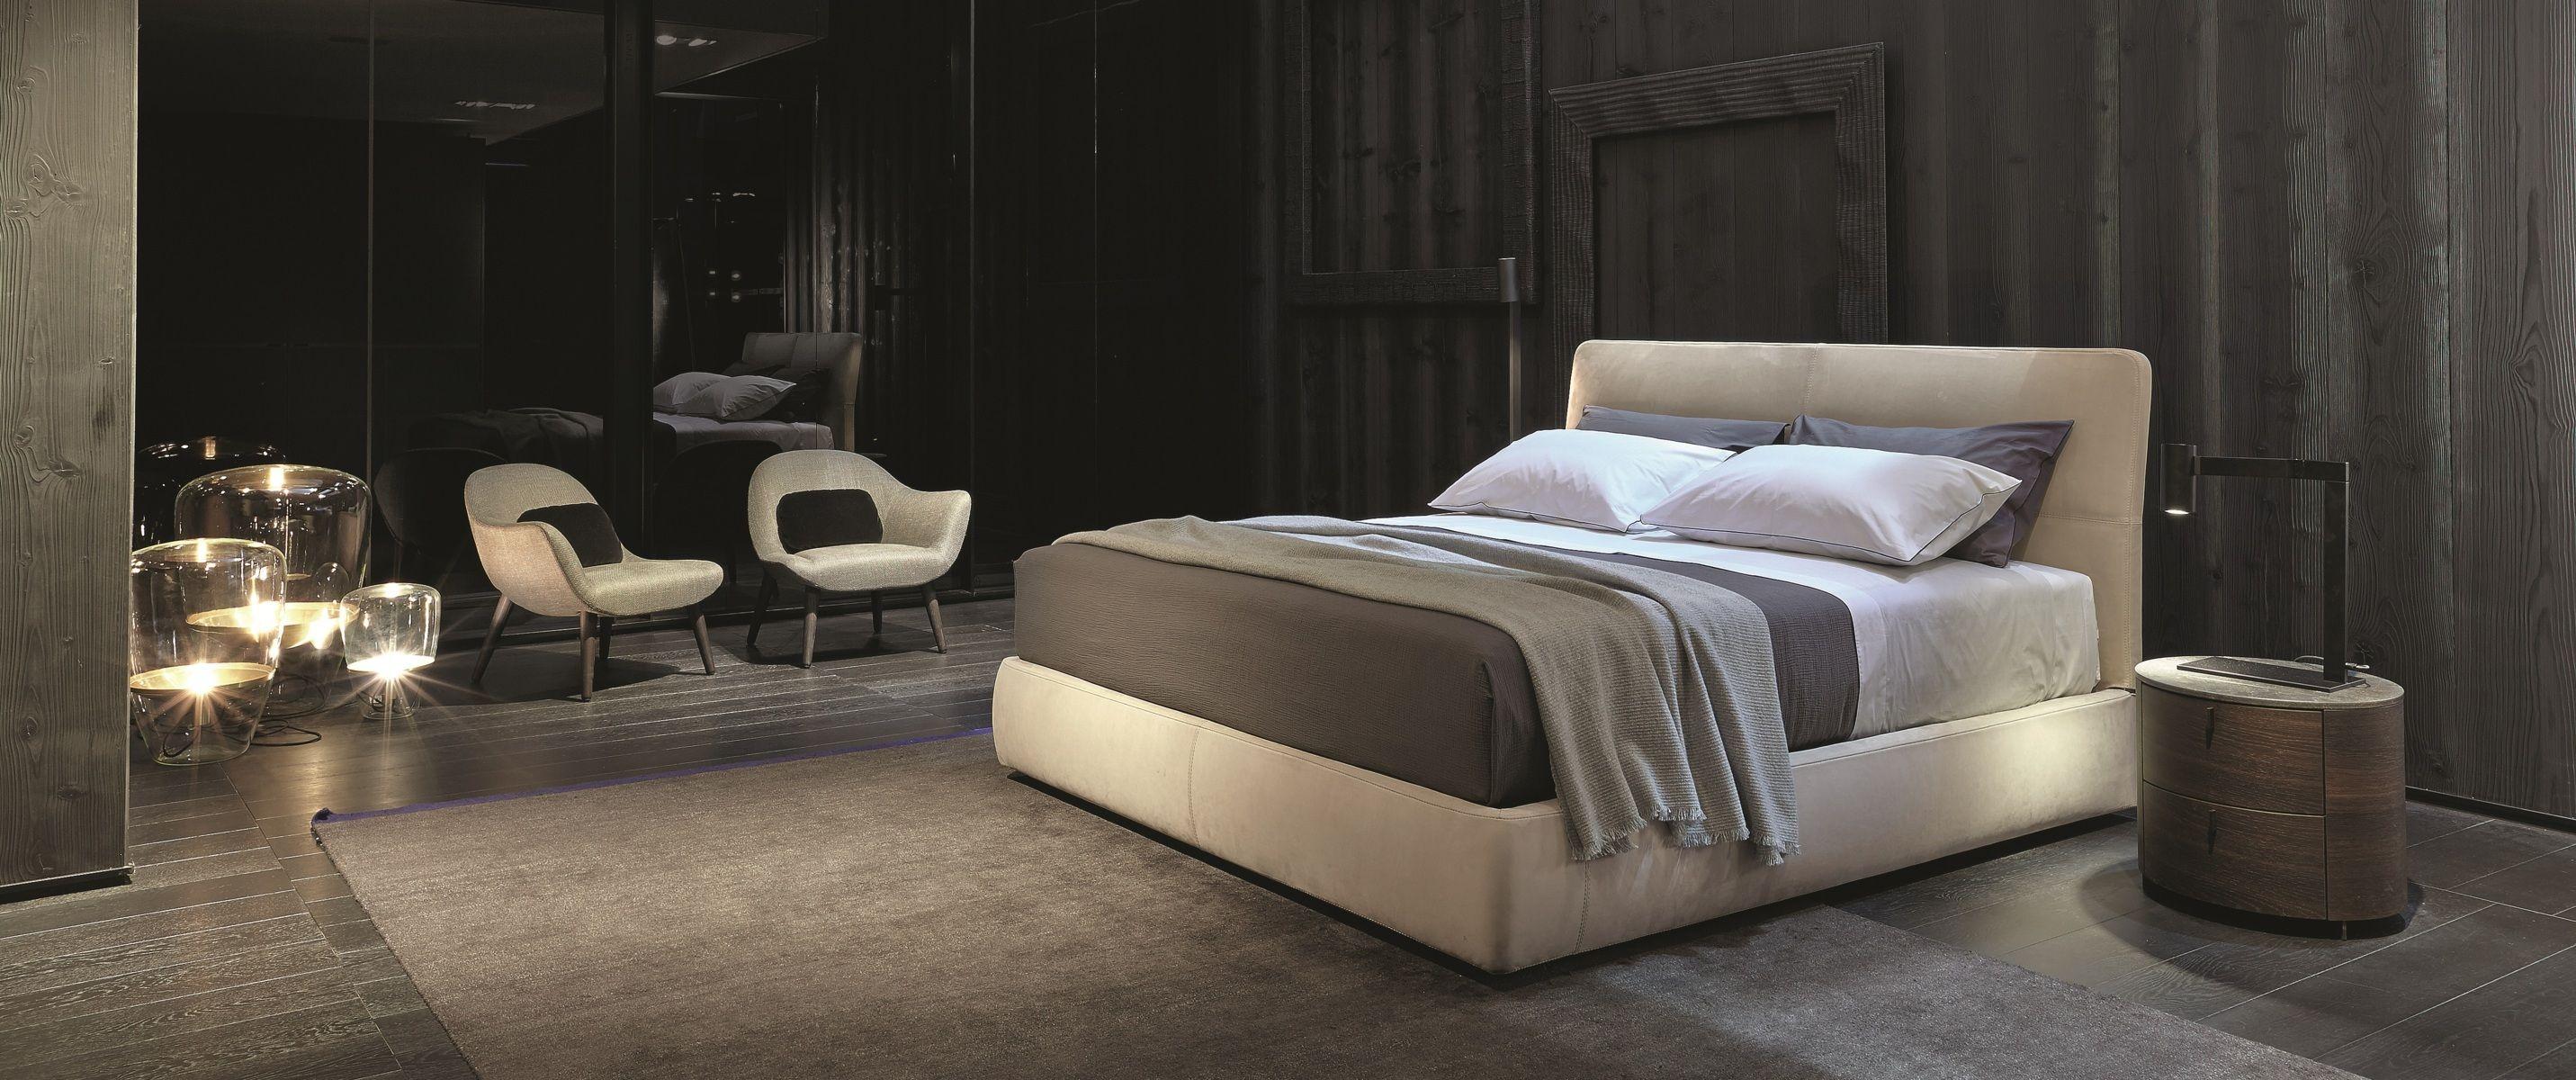 Poliform Varenna Laze Bed Onda Night Tables Mad Chair